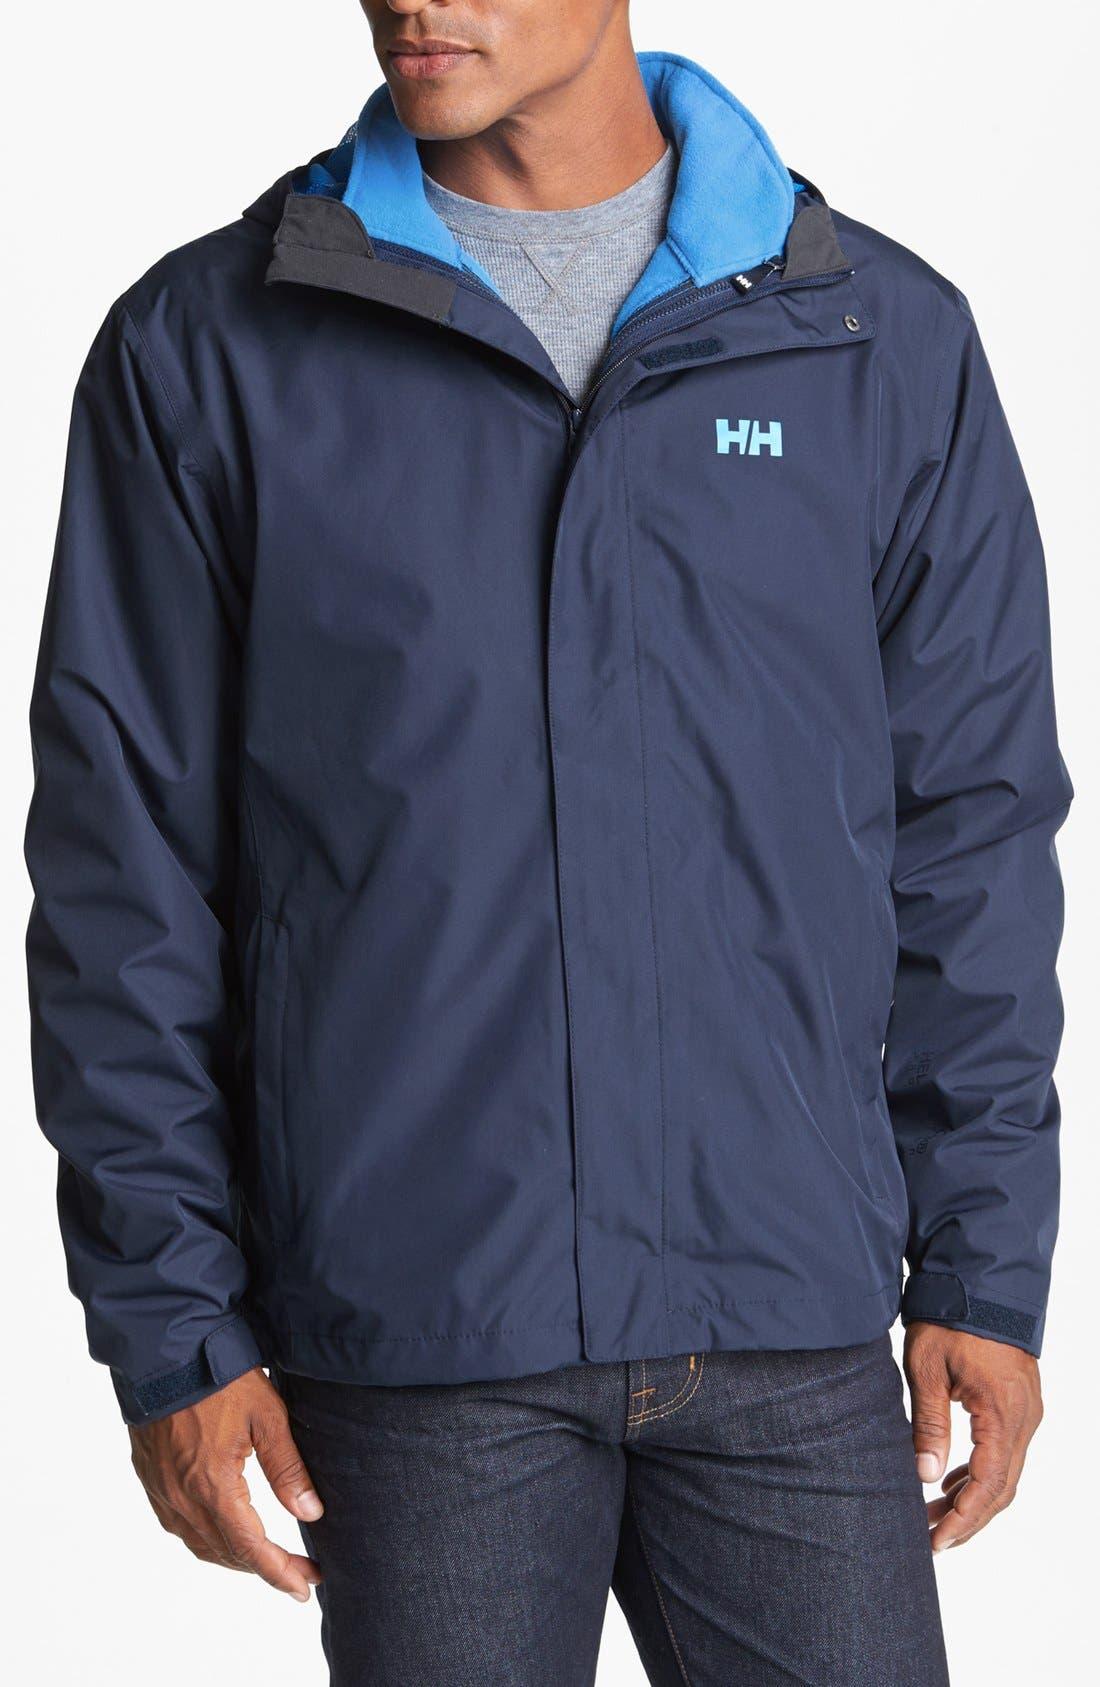 Main Image - Helly Hansen 'Seven J' 3-in-1 Jacket